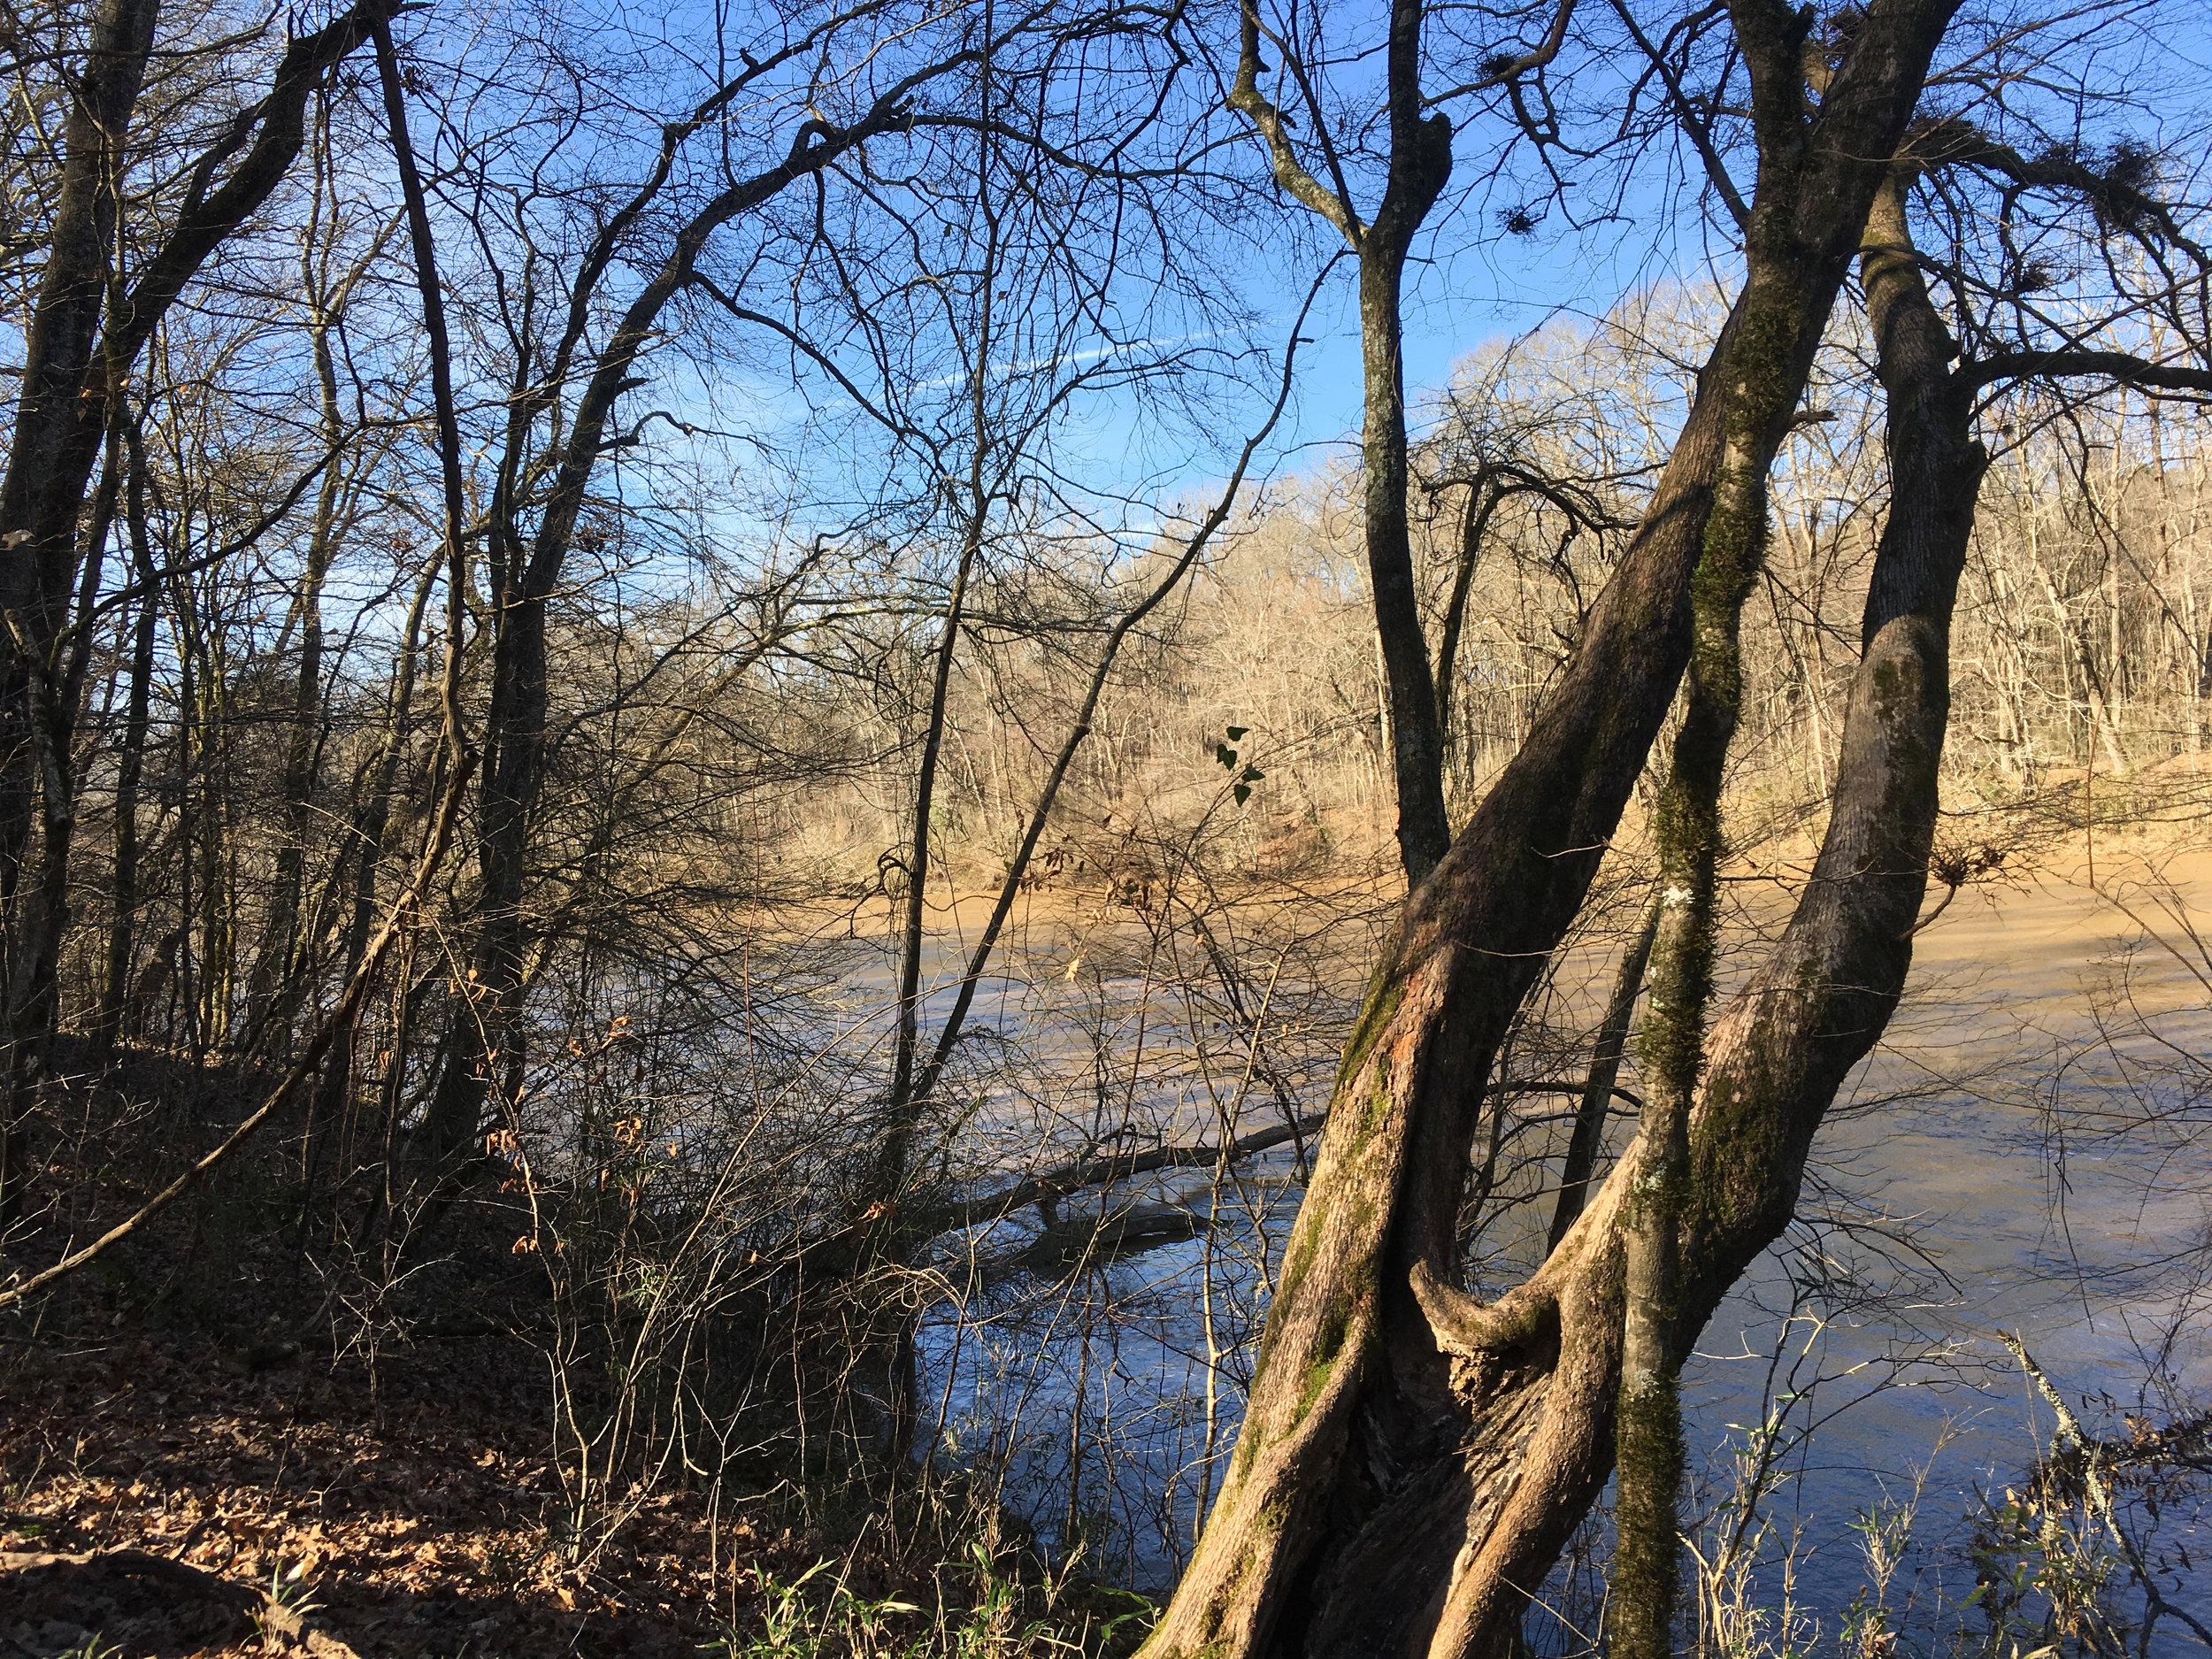 Chattahoochee River, January 25, 2019